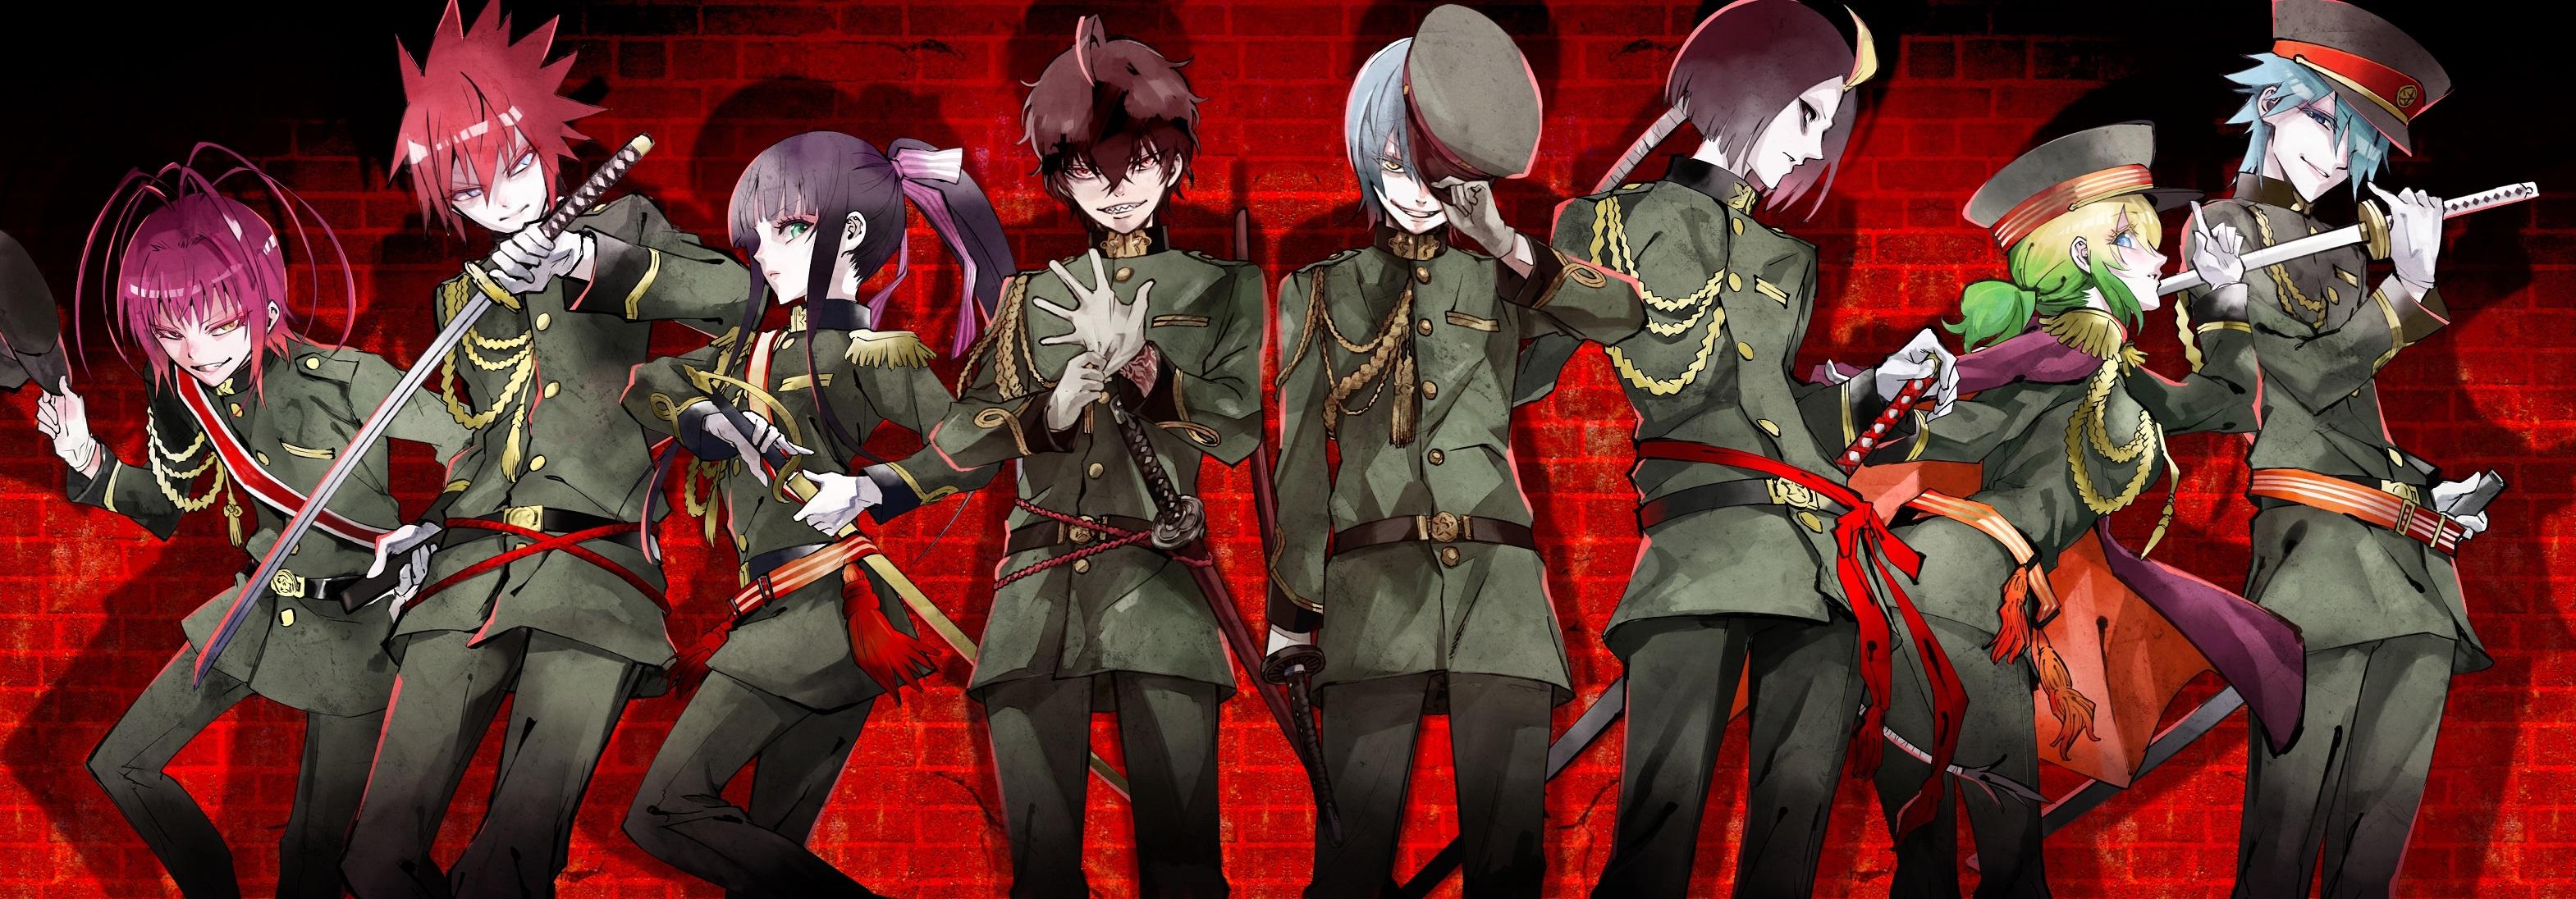 Anime Military Uniforms Is Love Life Disqus